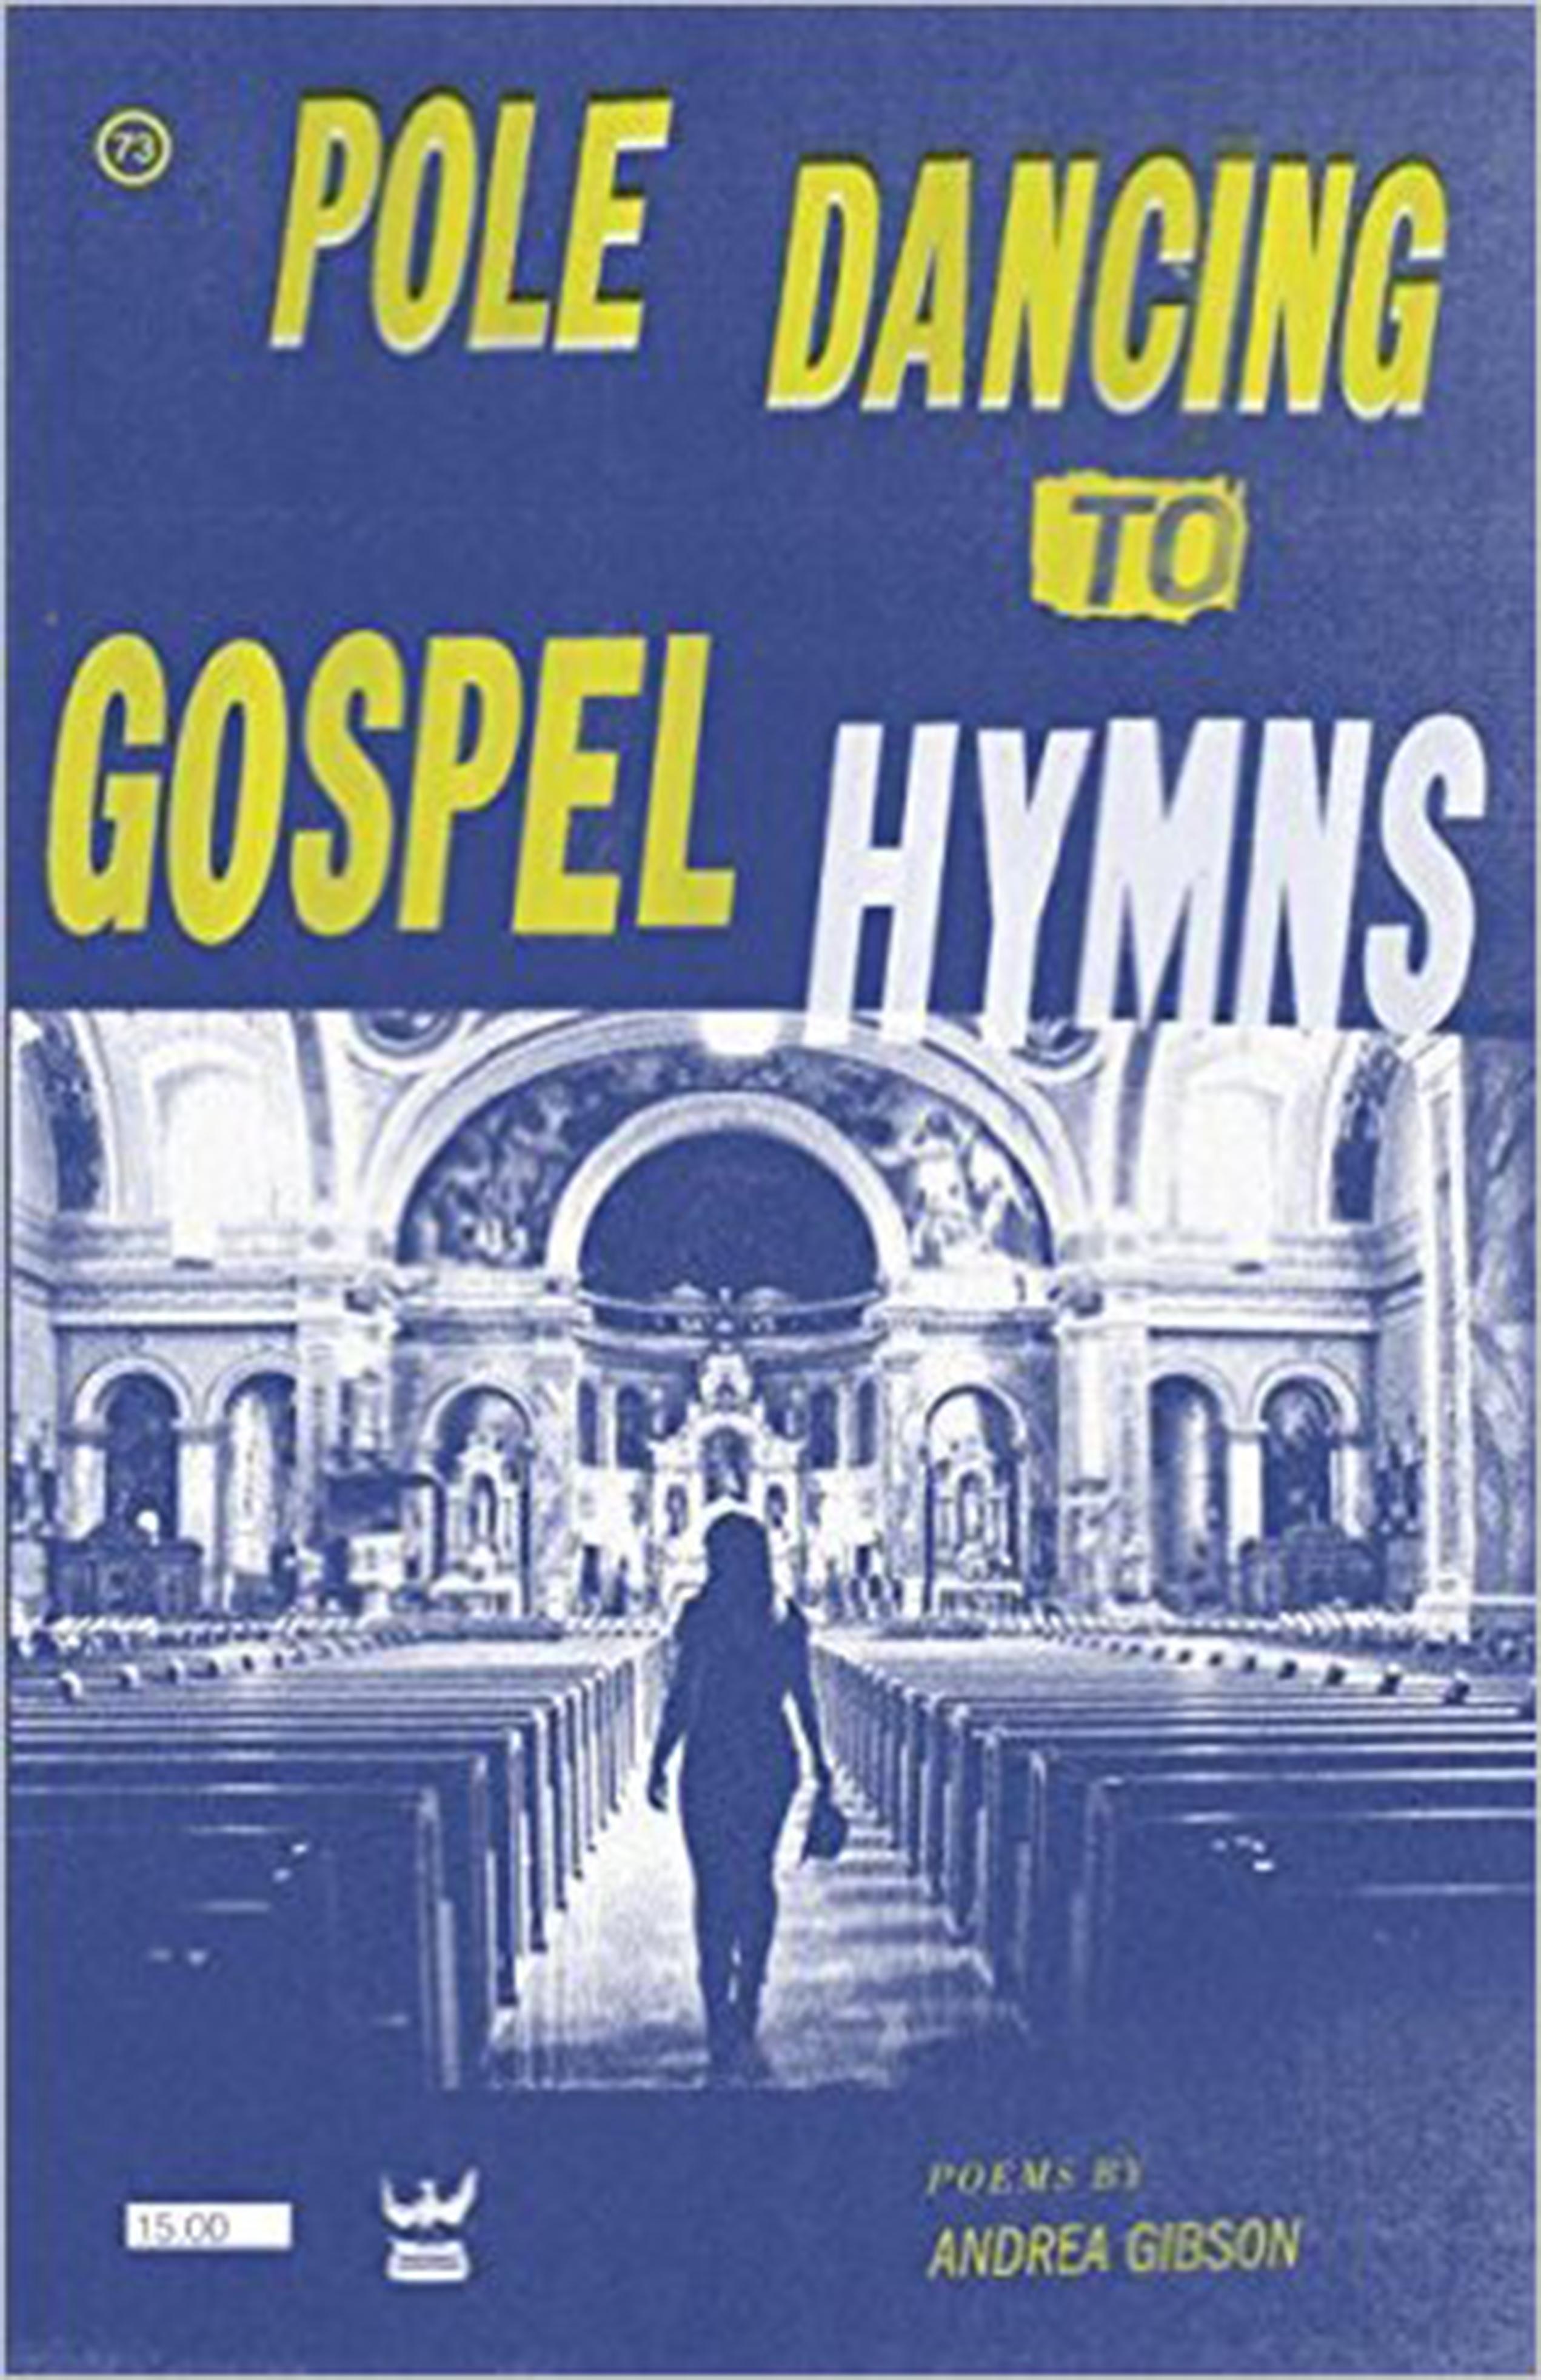 Andrea gibson pole dancing to gospel hymns v2 paperback book pole dancing to gospel hymns v2 reviewsmspy